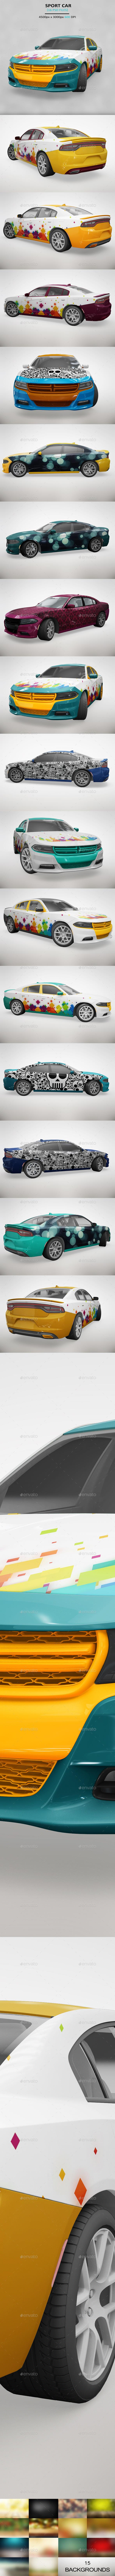 GraphicRiver Car MockUp 20885478